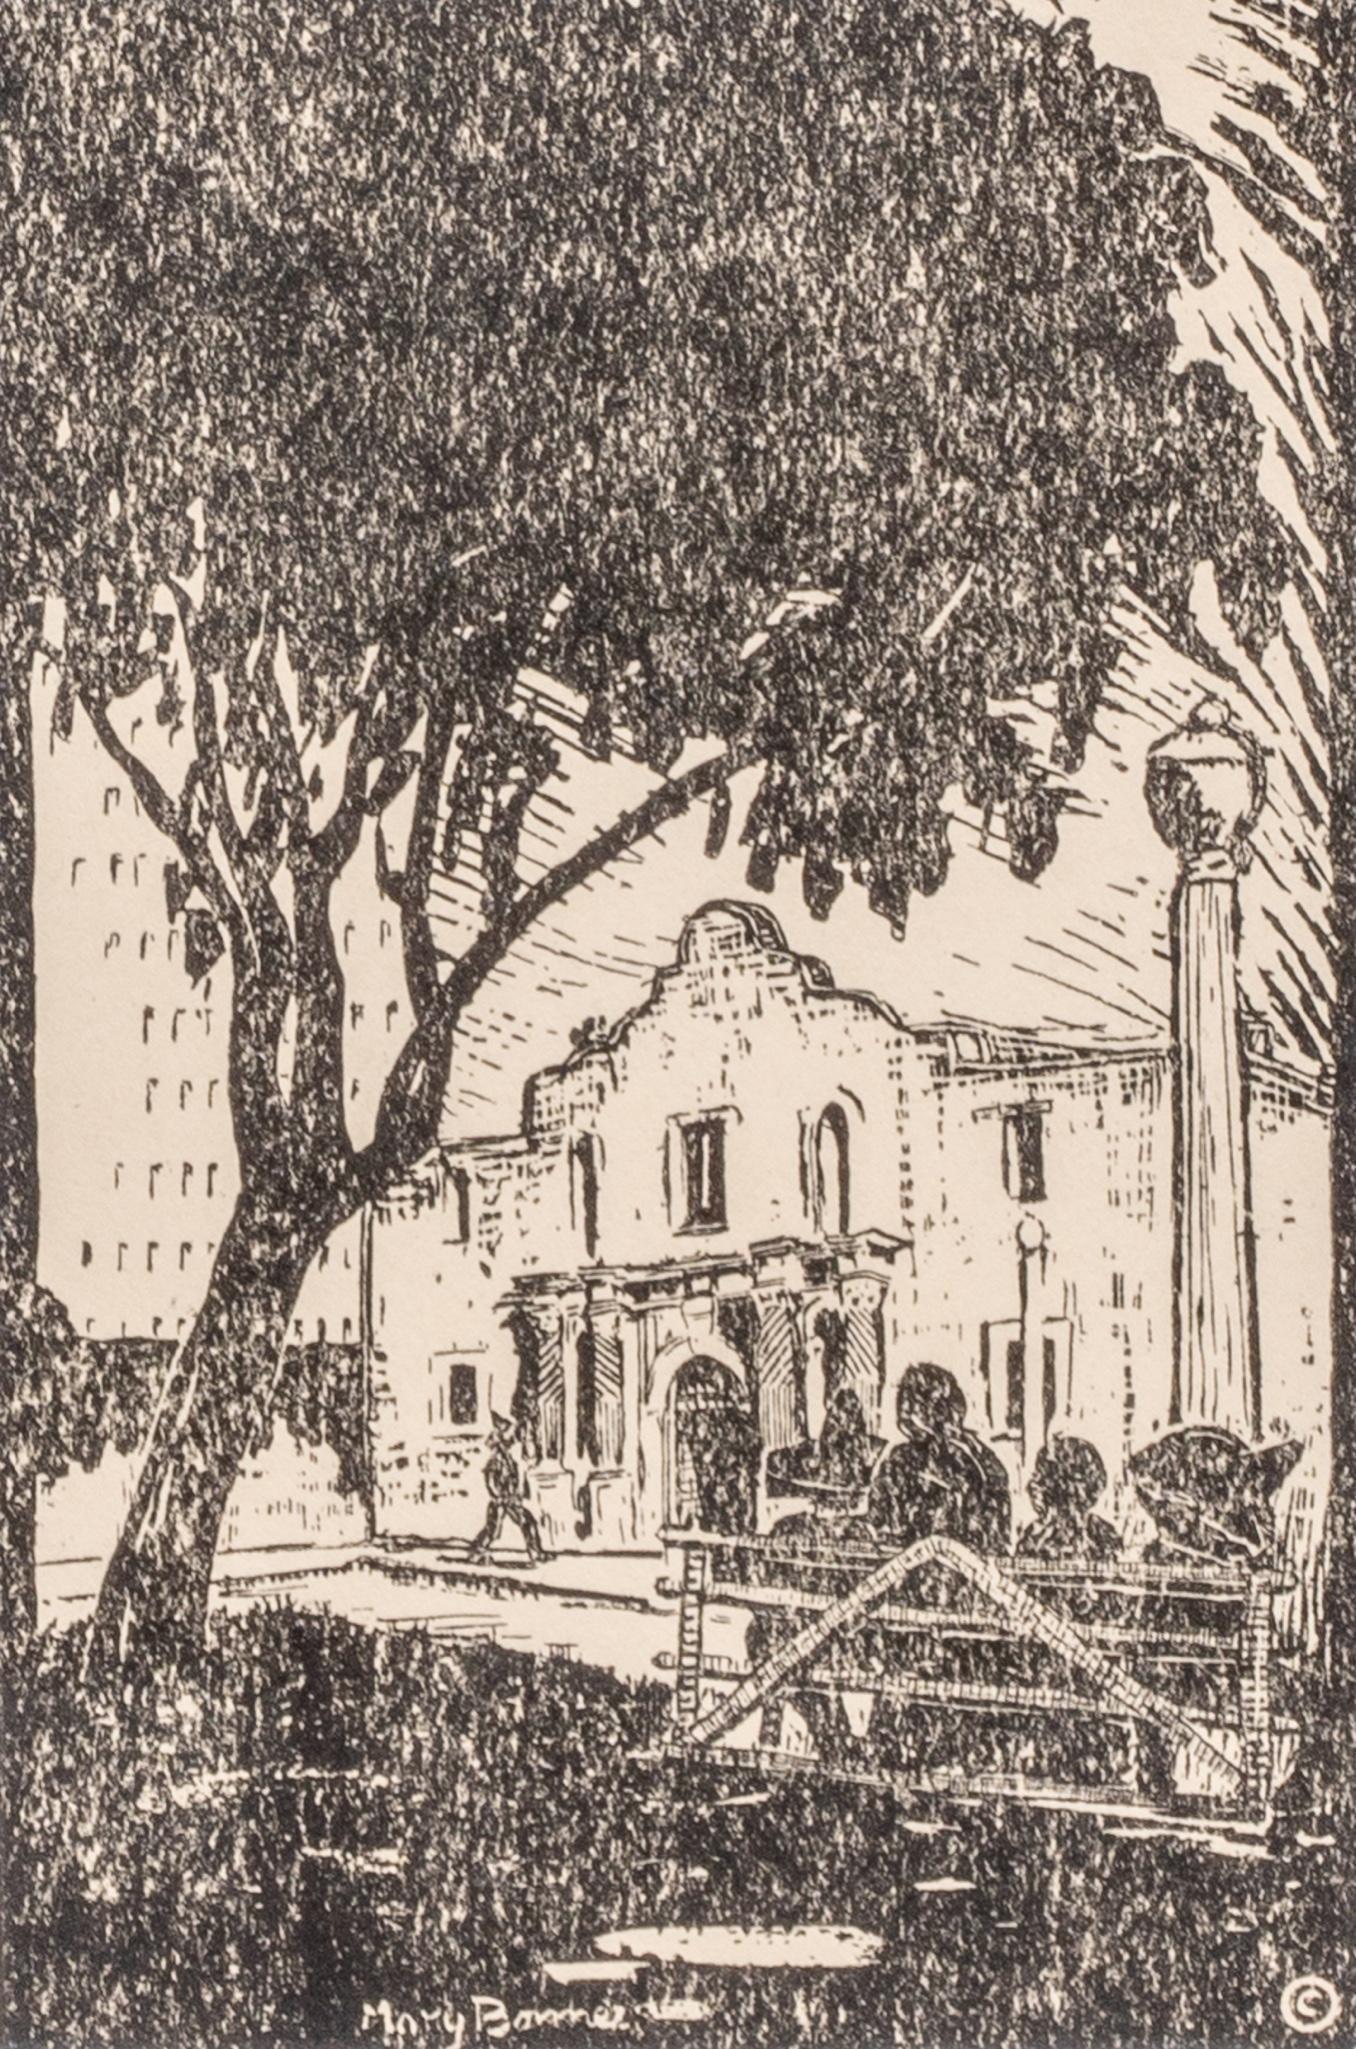 Mary Bonner (1887-1935), The Alamo, 1928, woodblock,